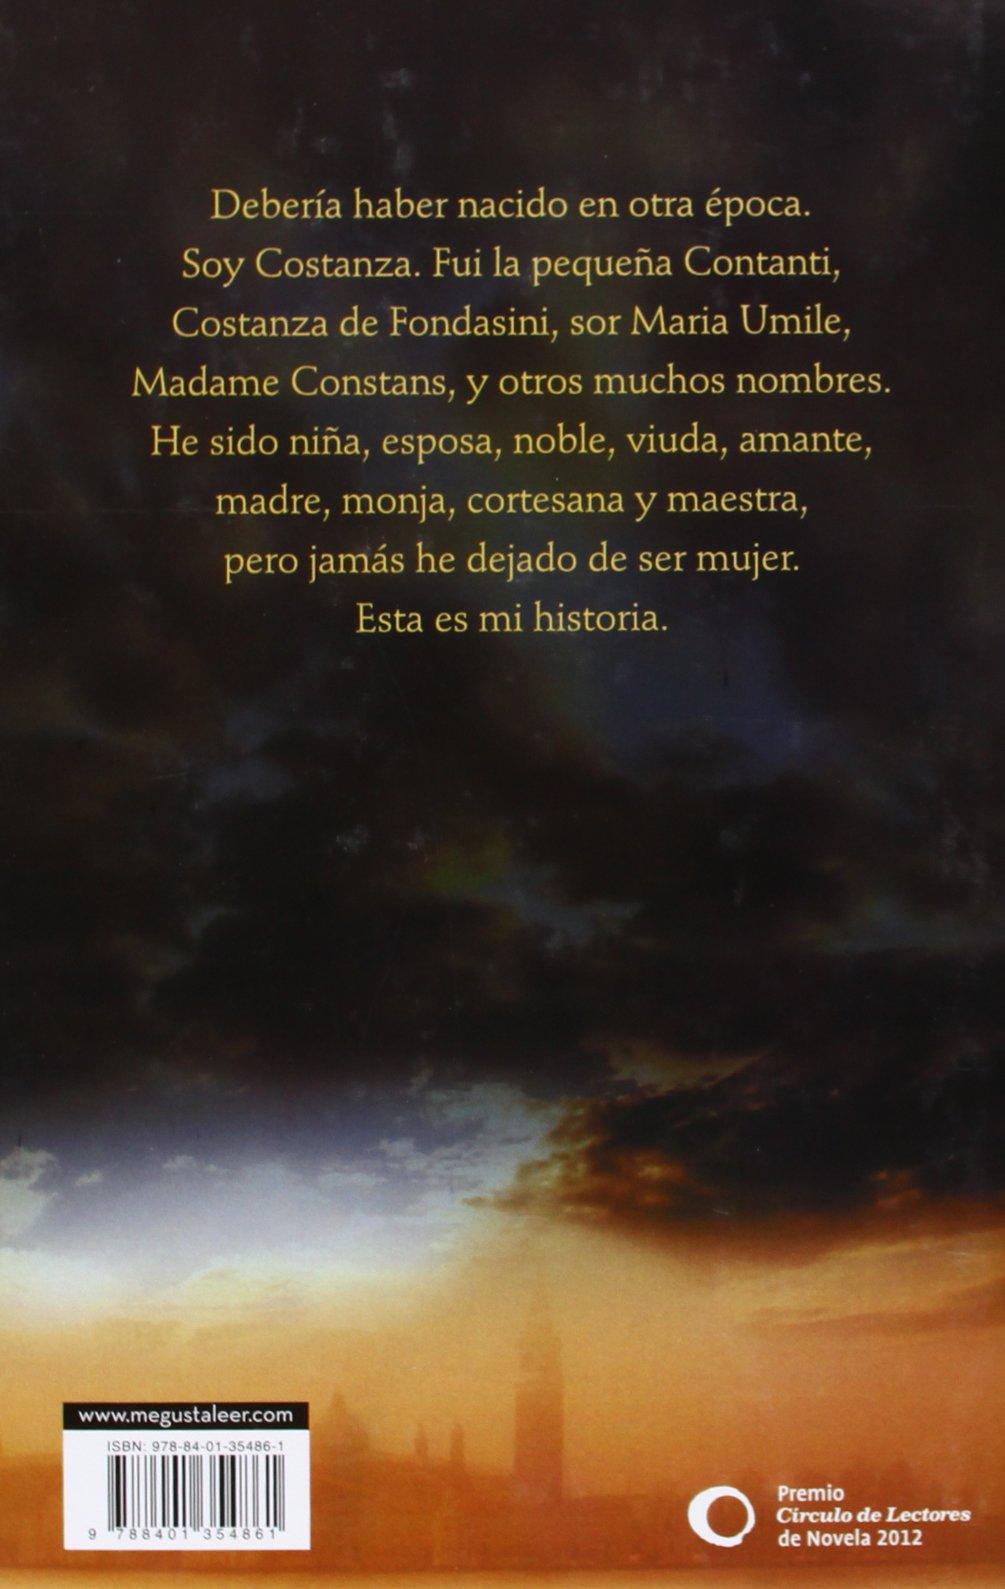 La máscara veneciana / The venecian mask (Spanish Edition): Gloria Codina: 9788401354861: Amazon.com: Books